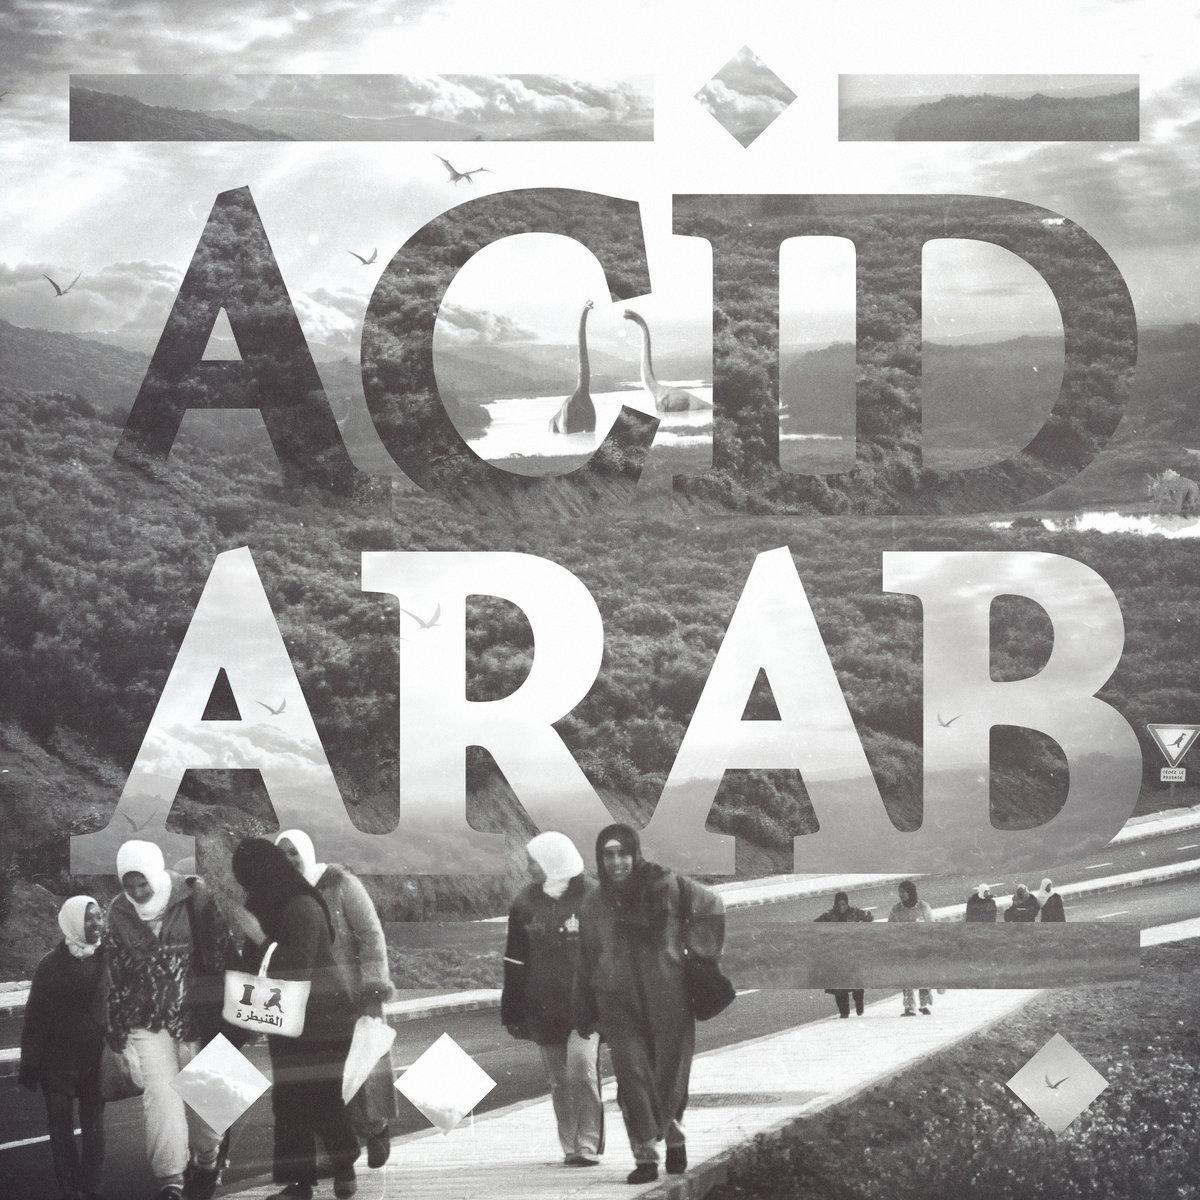 Artists: Cottam, Gilb'r, Acid Arab. I:Cube, Pépé Bradock, Osunlade,The Maghreban, Zombie Zombie, DJ Sotofett, Chateau Flight, Joakim, Etienne Jaumet, Aladdin and The Big Crunch Theory.